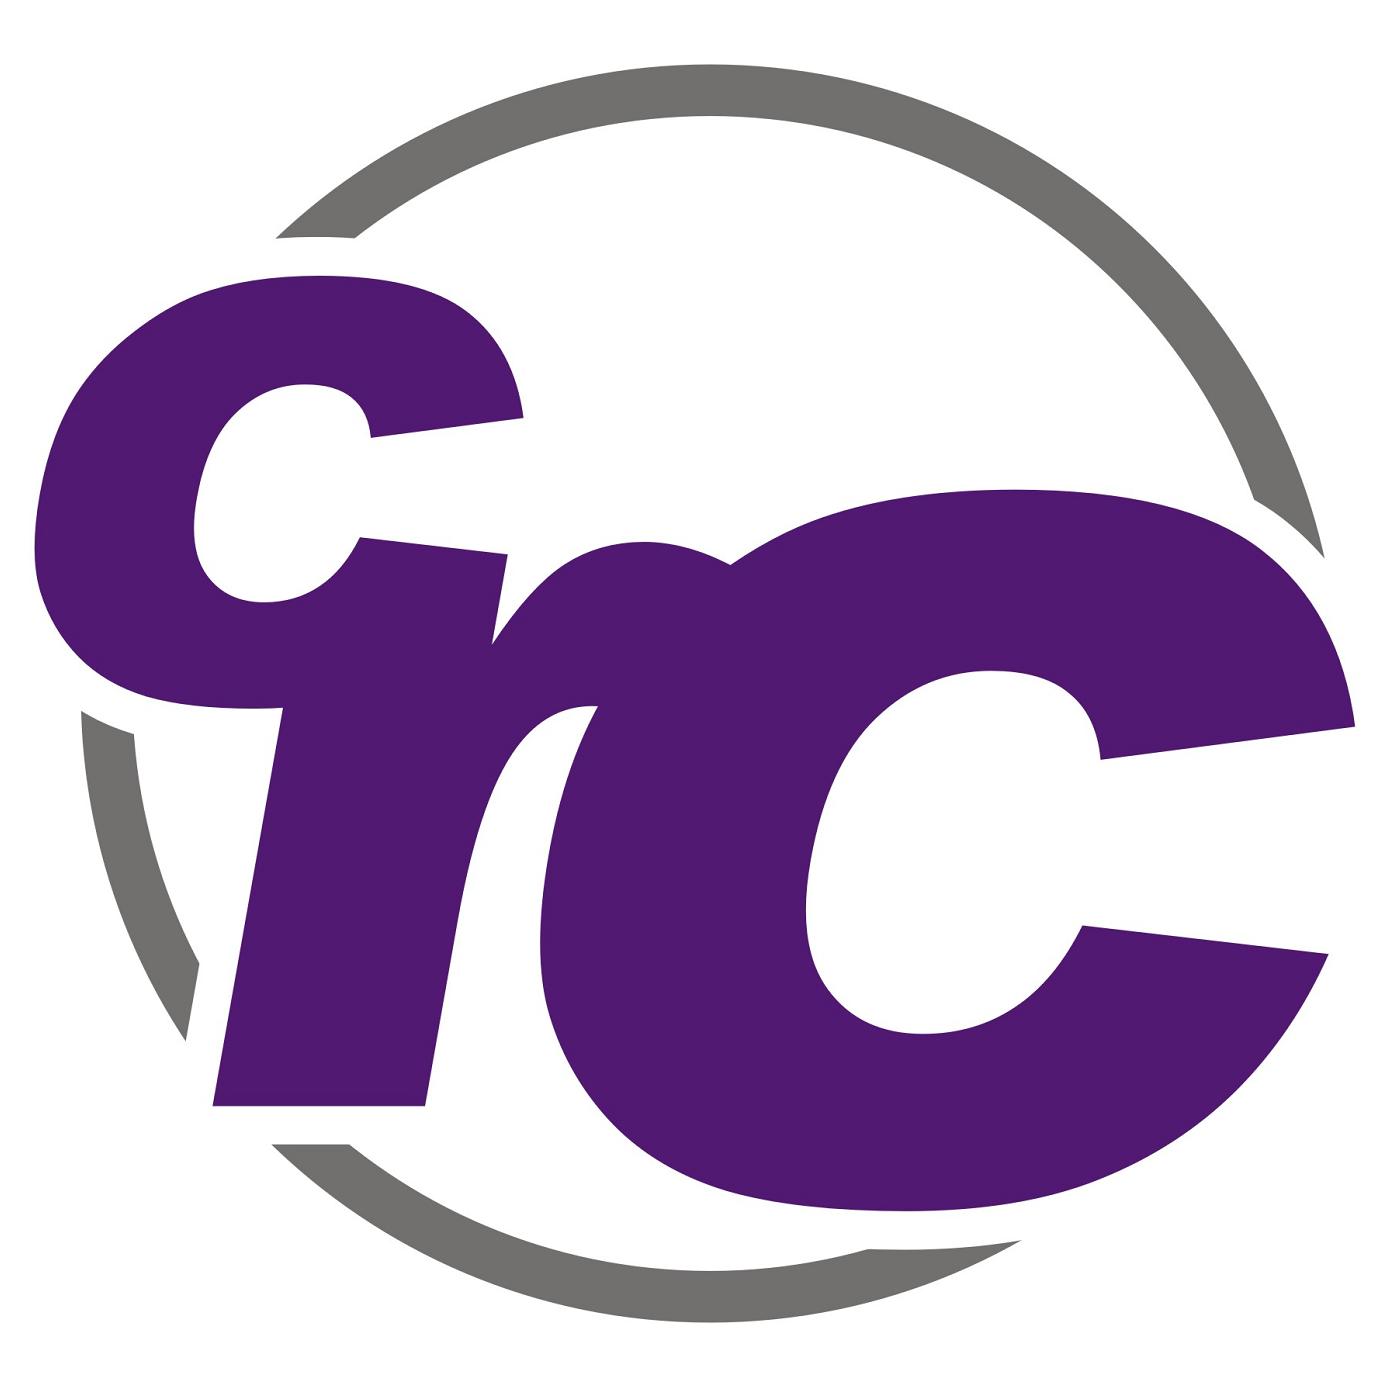 Culto Evangelico - 2015